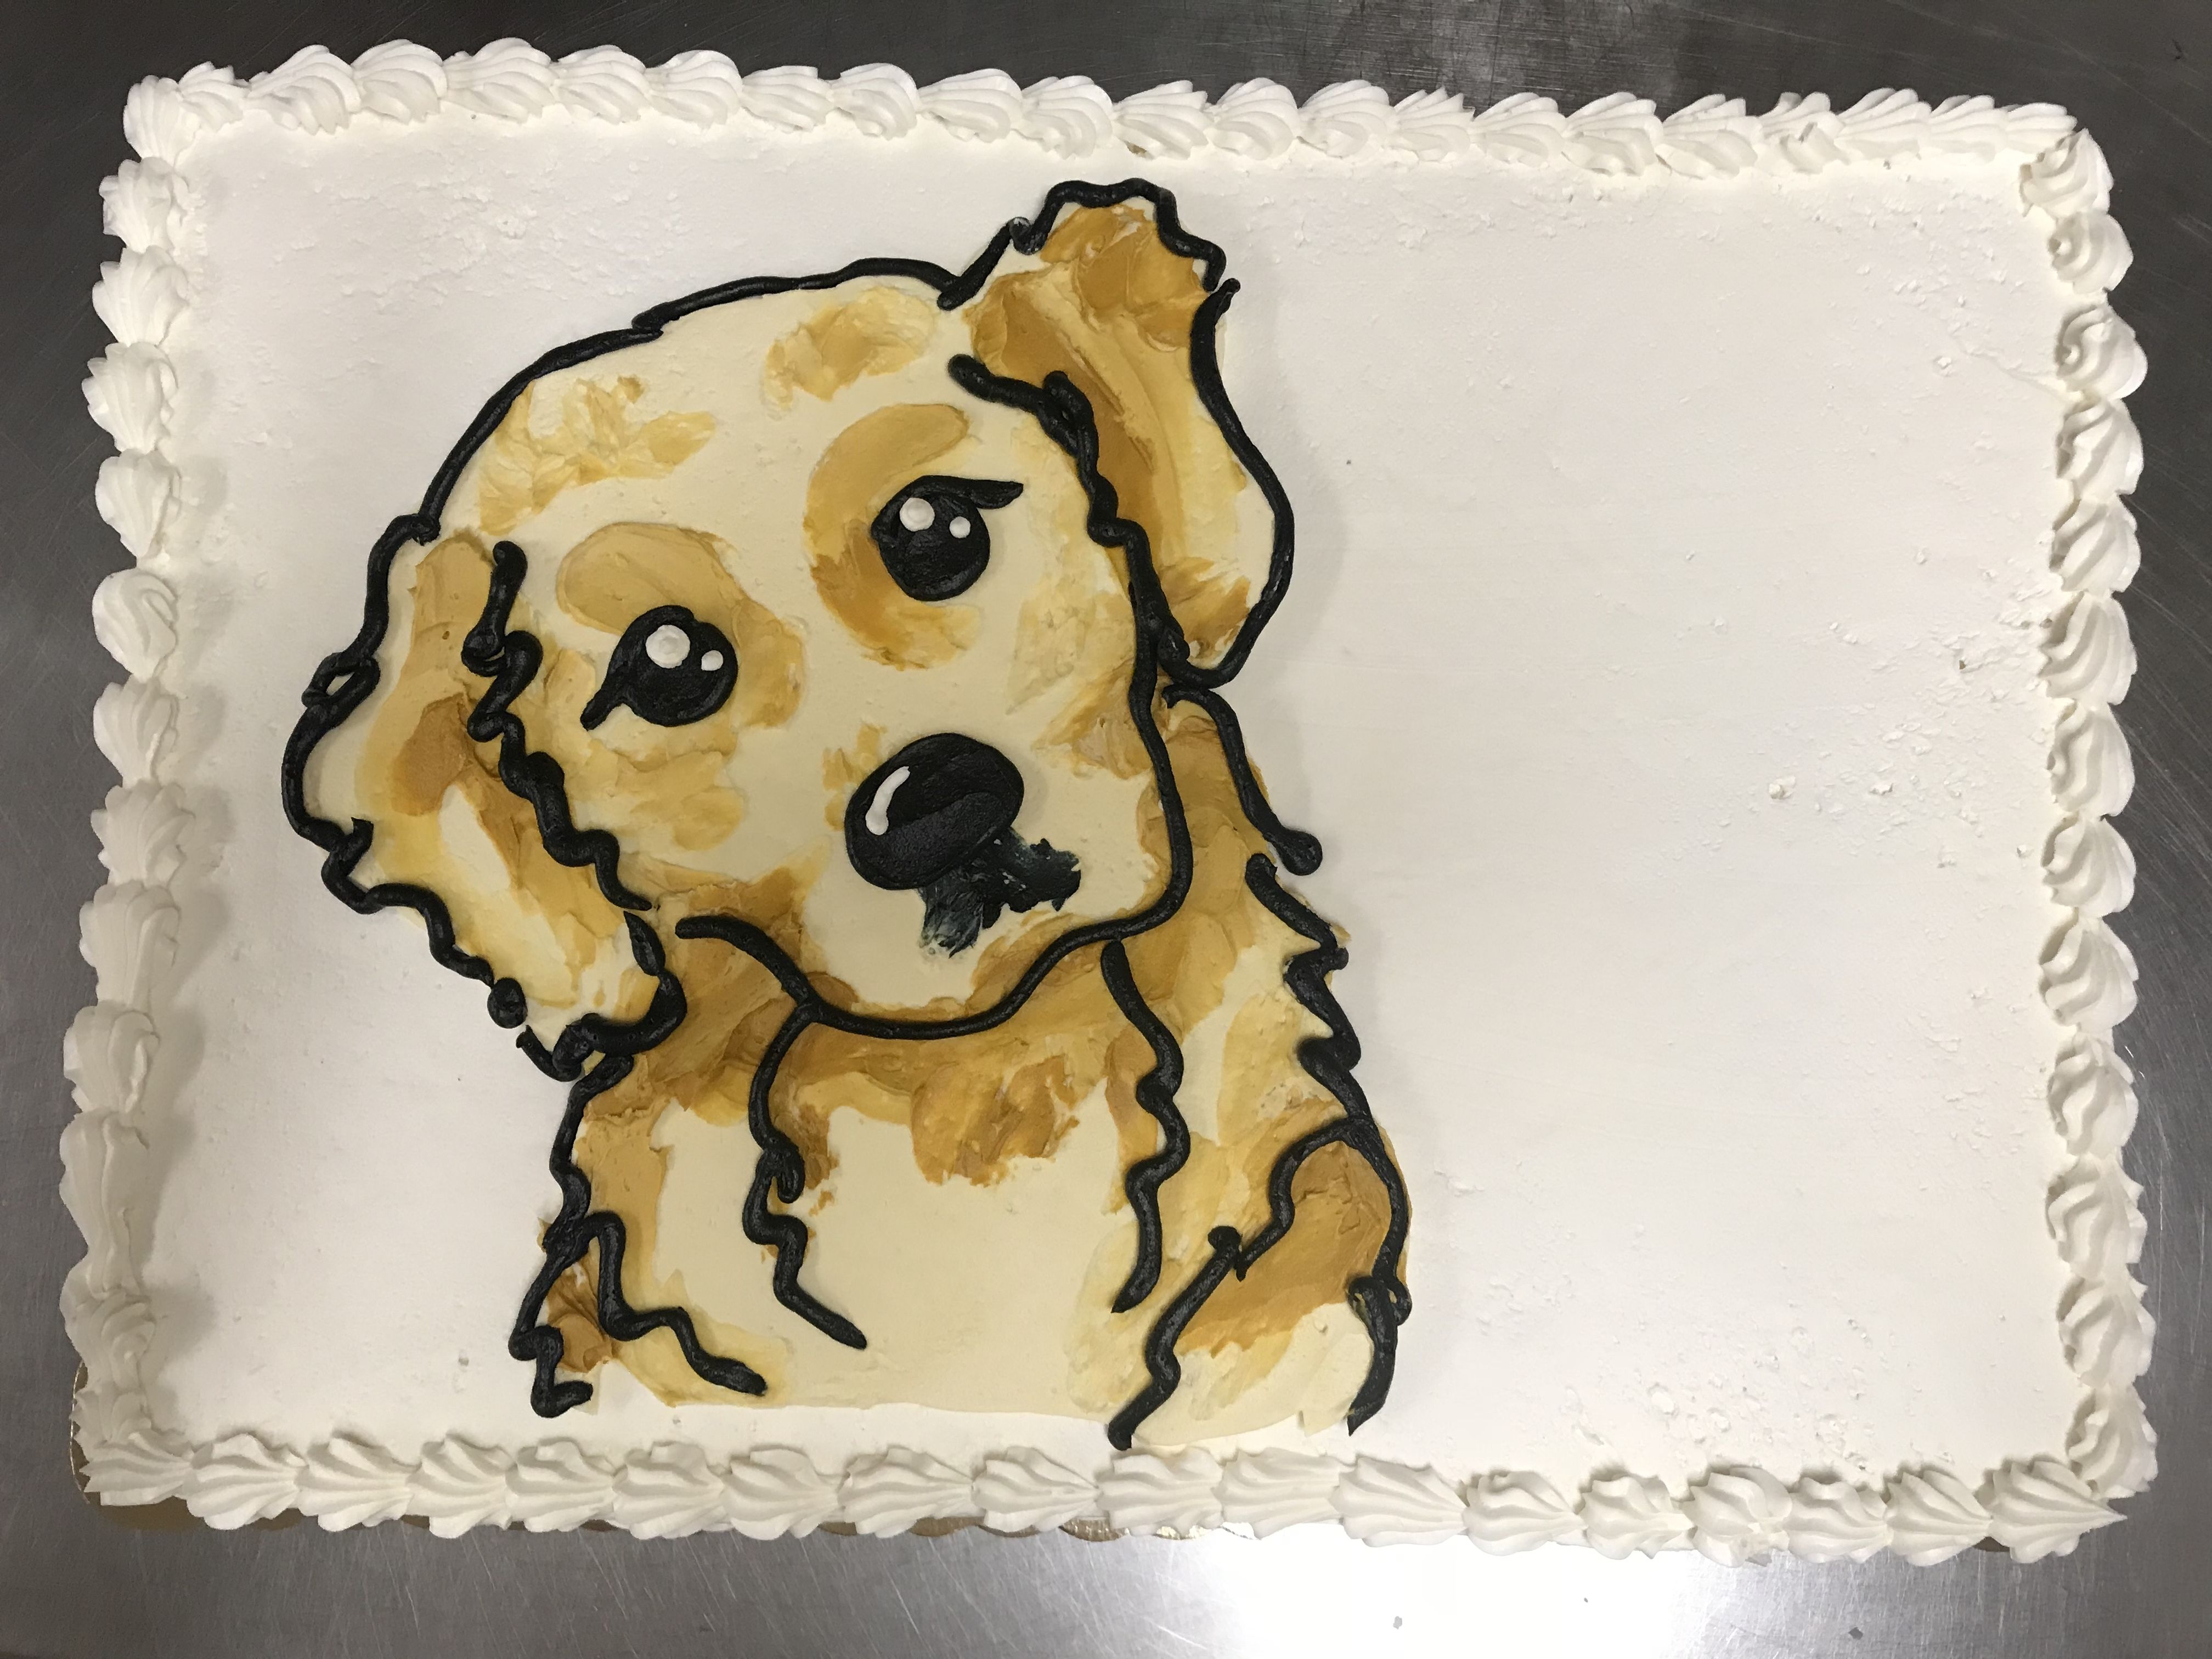 Golden Retriever Cake Golden Retriever Cake Animal Cakes Food